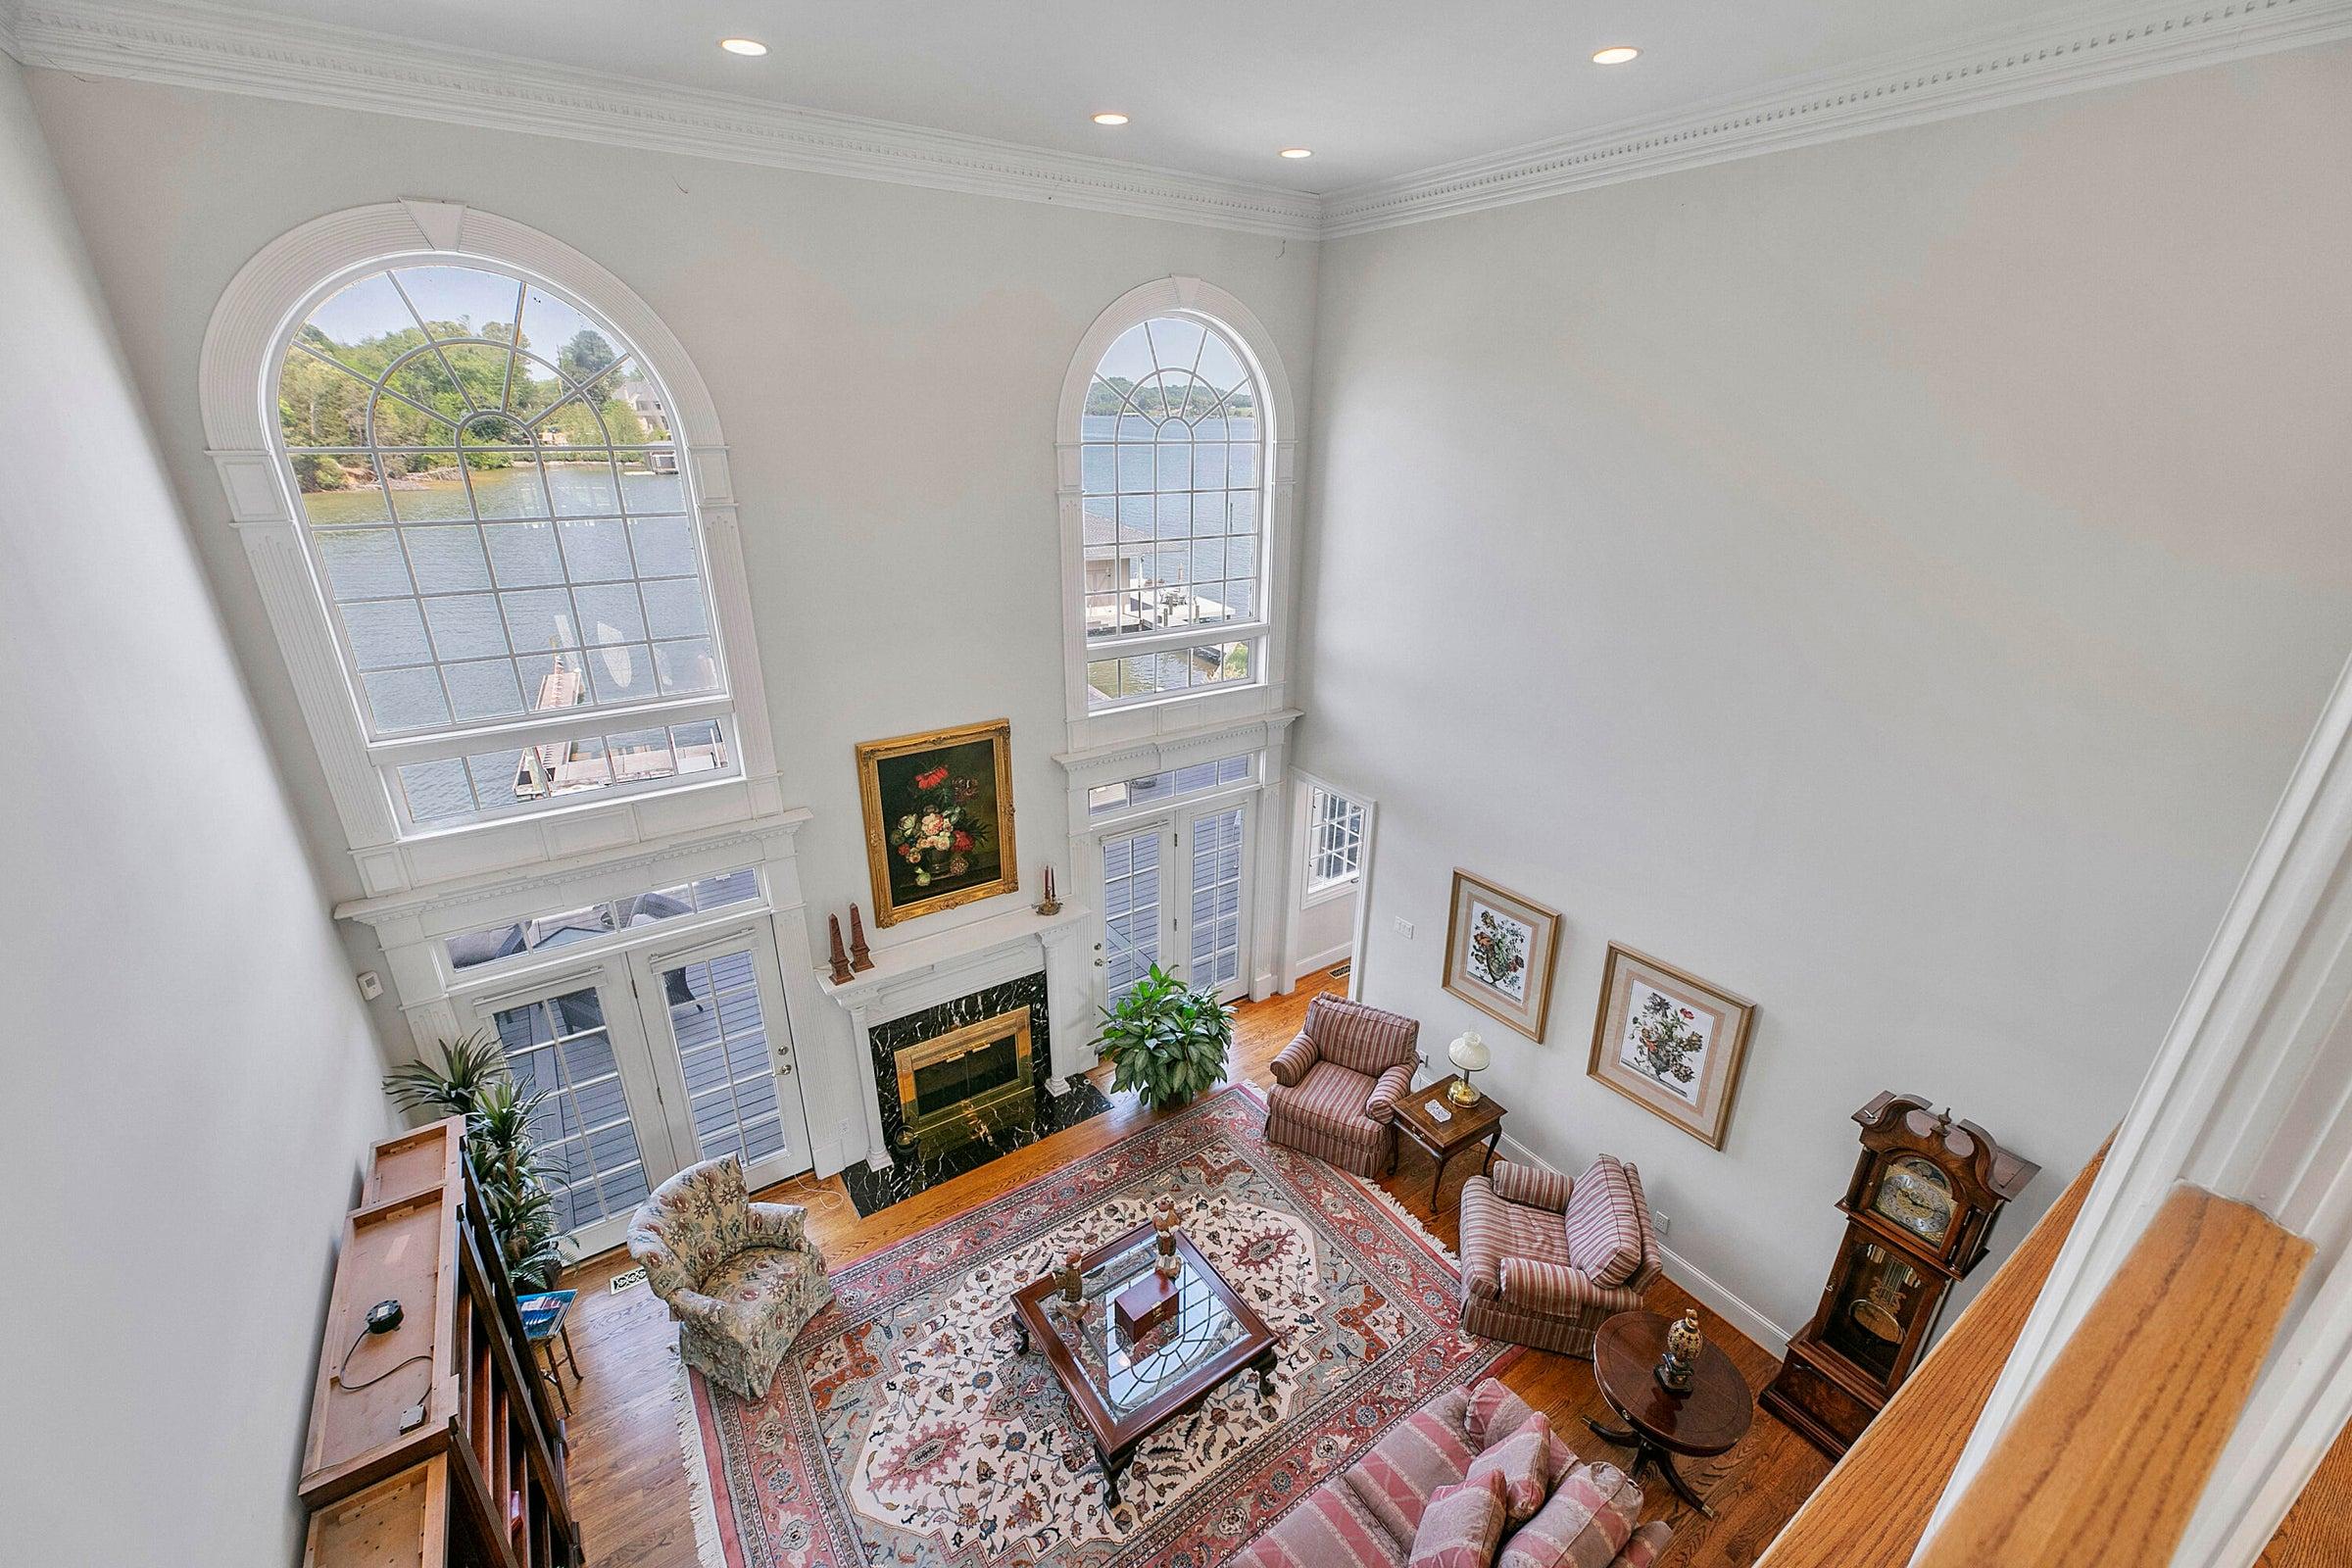 2nd floor view of living room